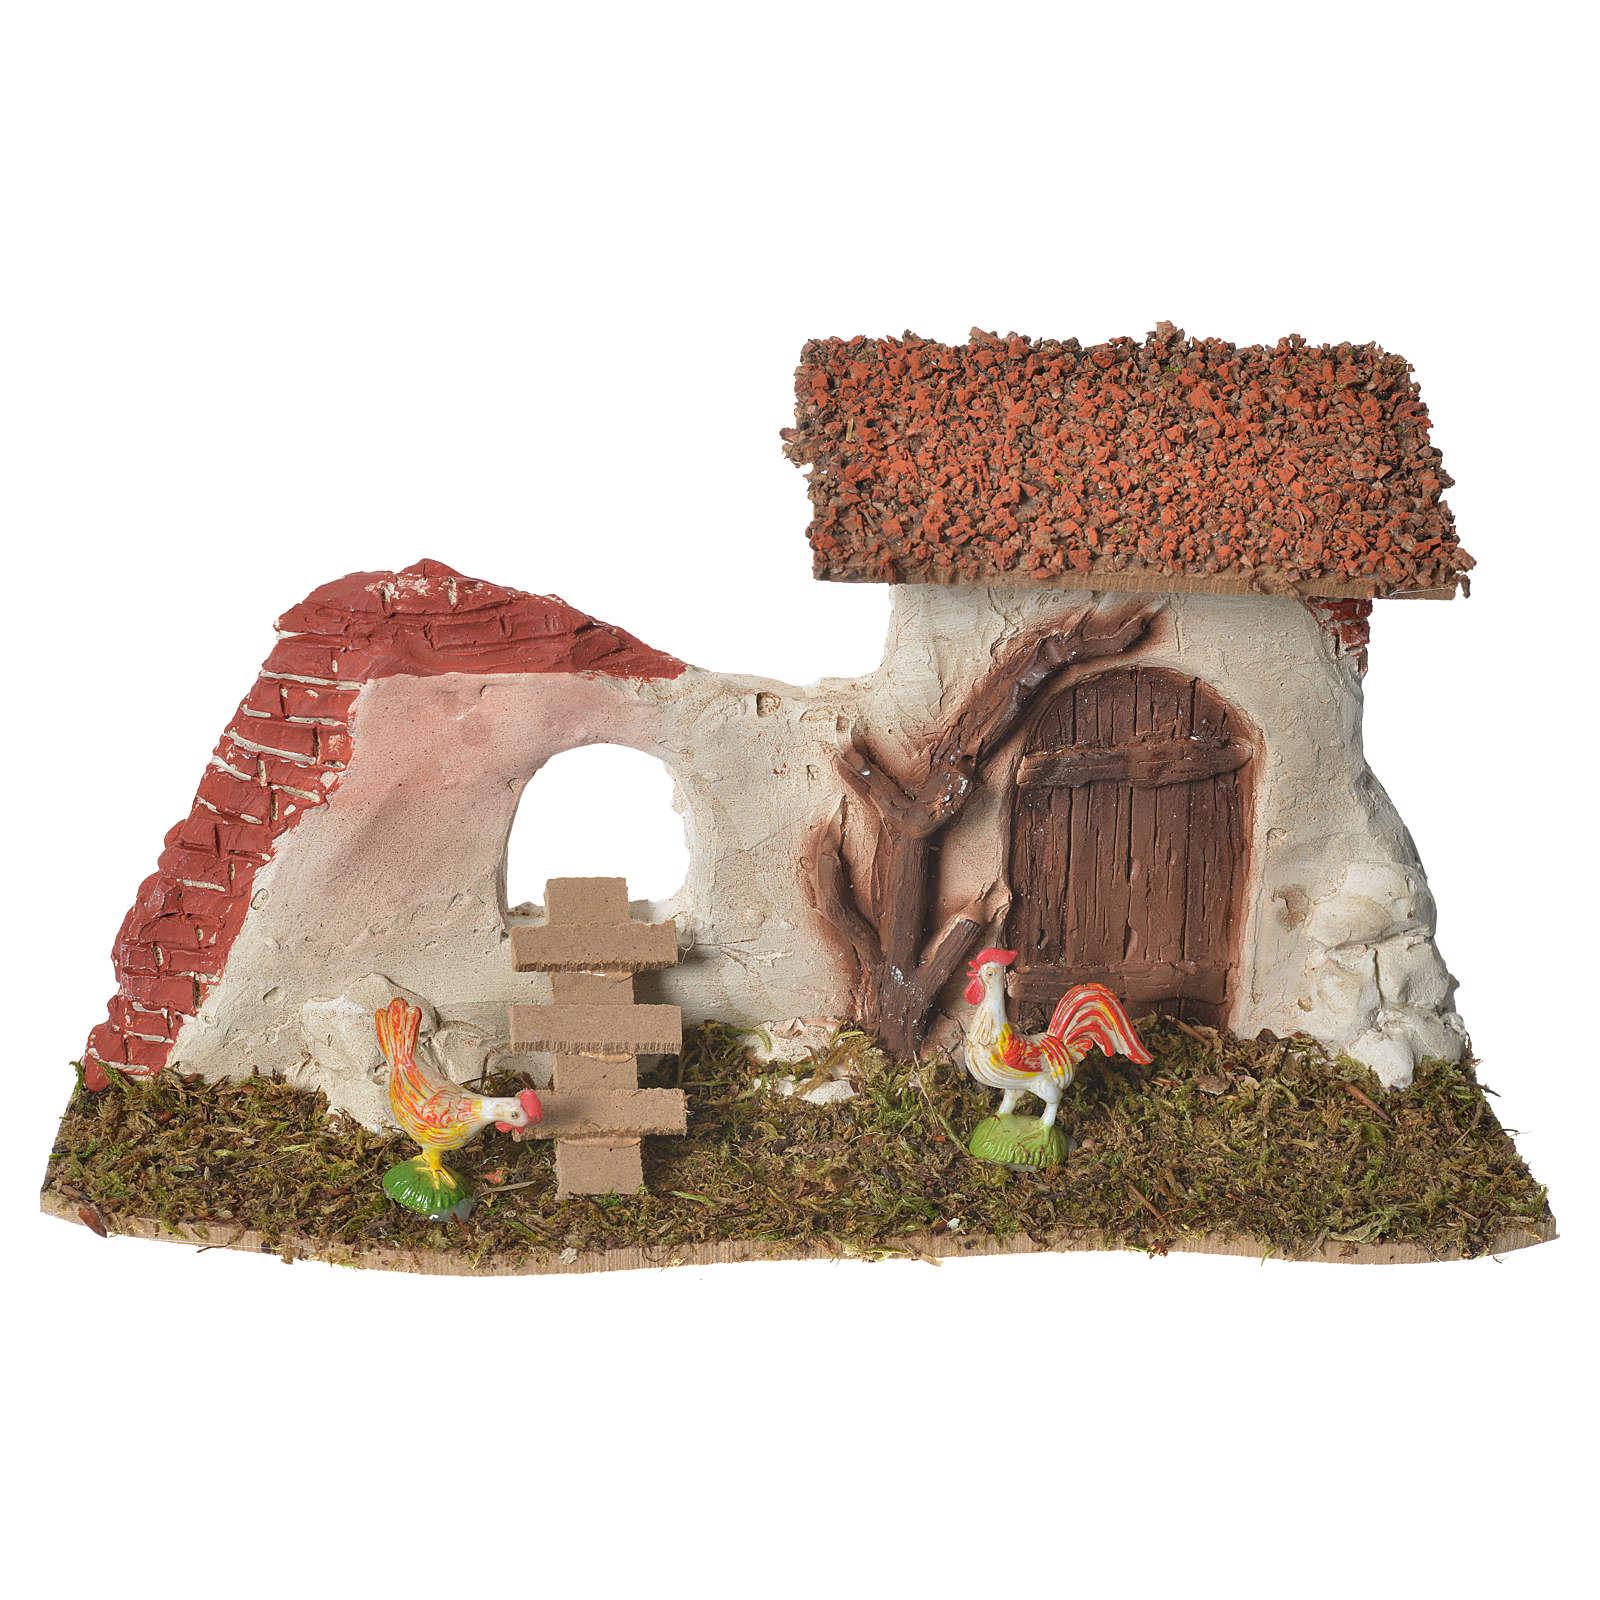 Nativity Scene hen house in plaster on wooden base 17x28x10 4